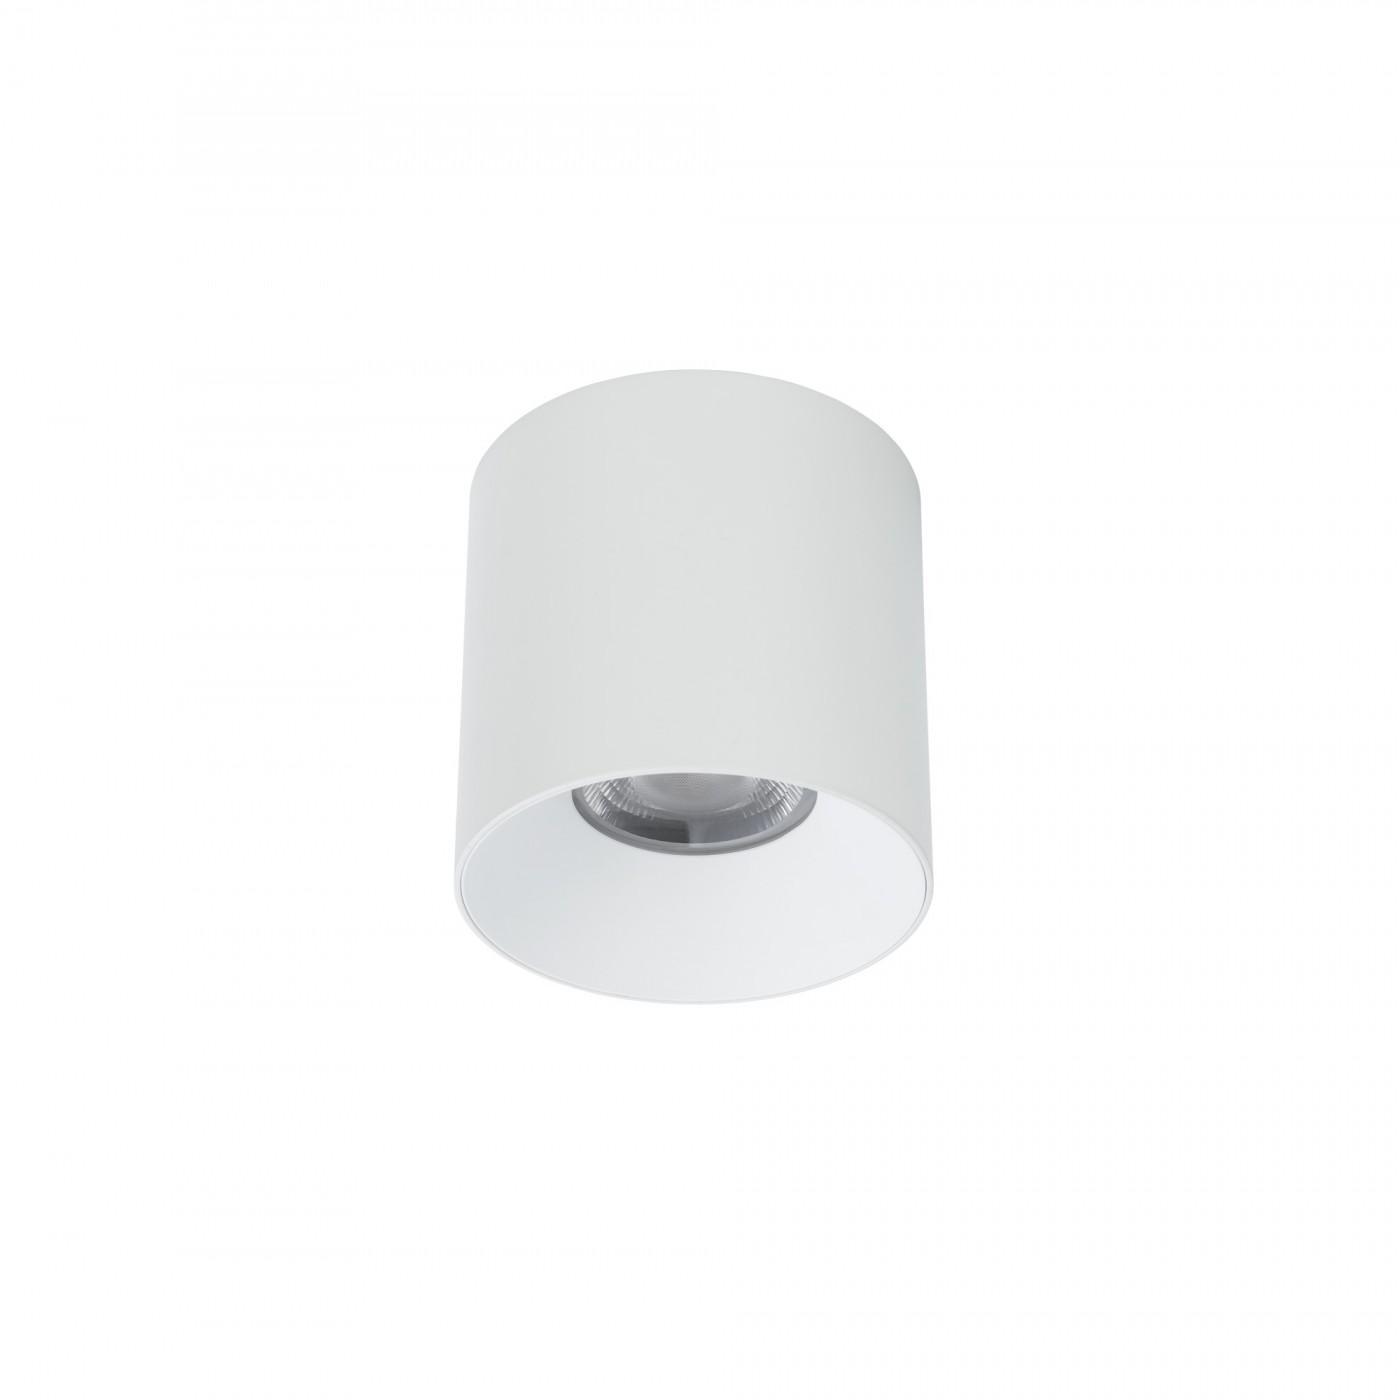 CL IOS LED 30W 3000K white 8735 Nowodvorski Lighting